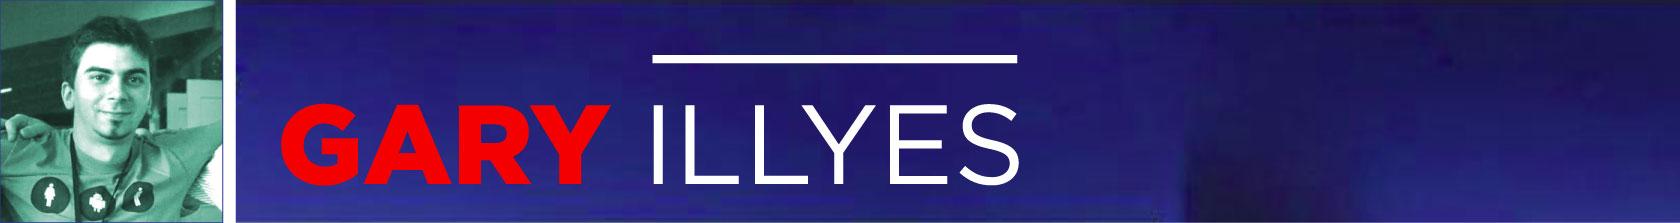 Gary Illyes